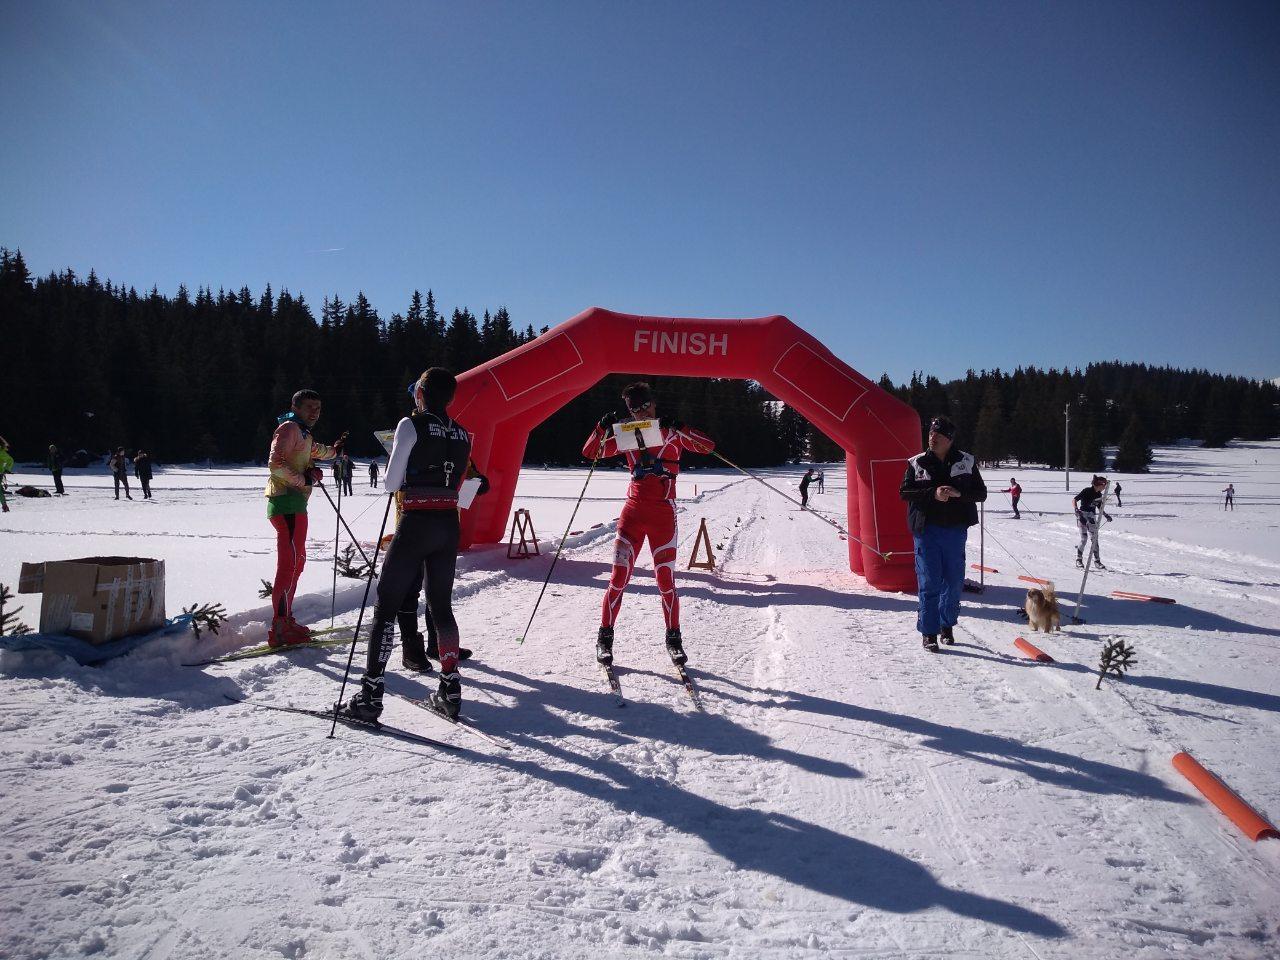 ДП ски ориентиране 2019 - финал